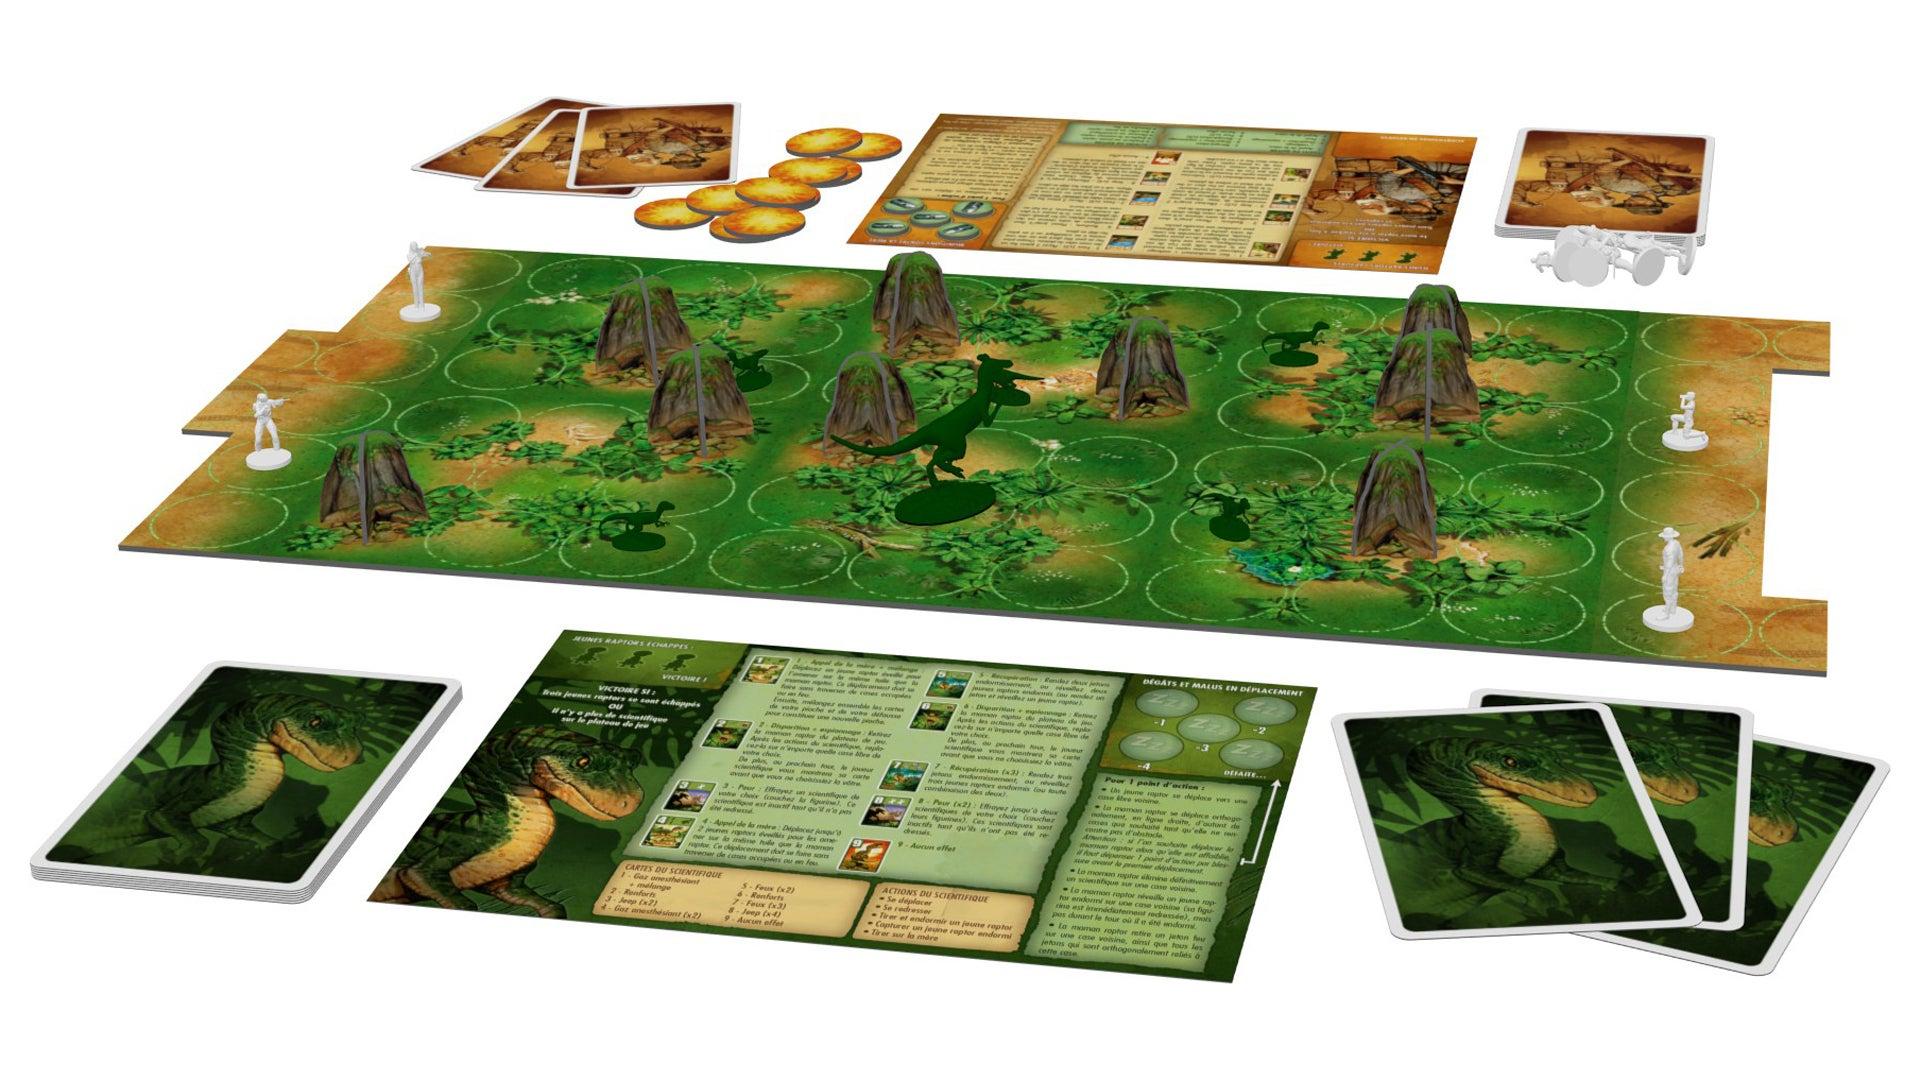 raptor-board-game-gameplay-layout.jpg